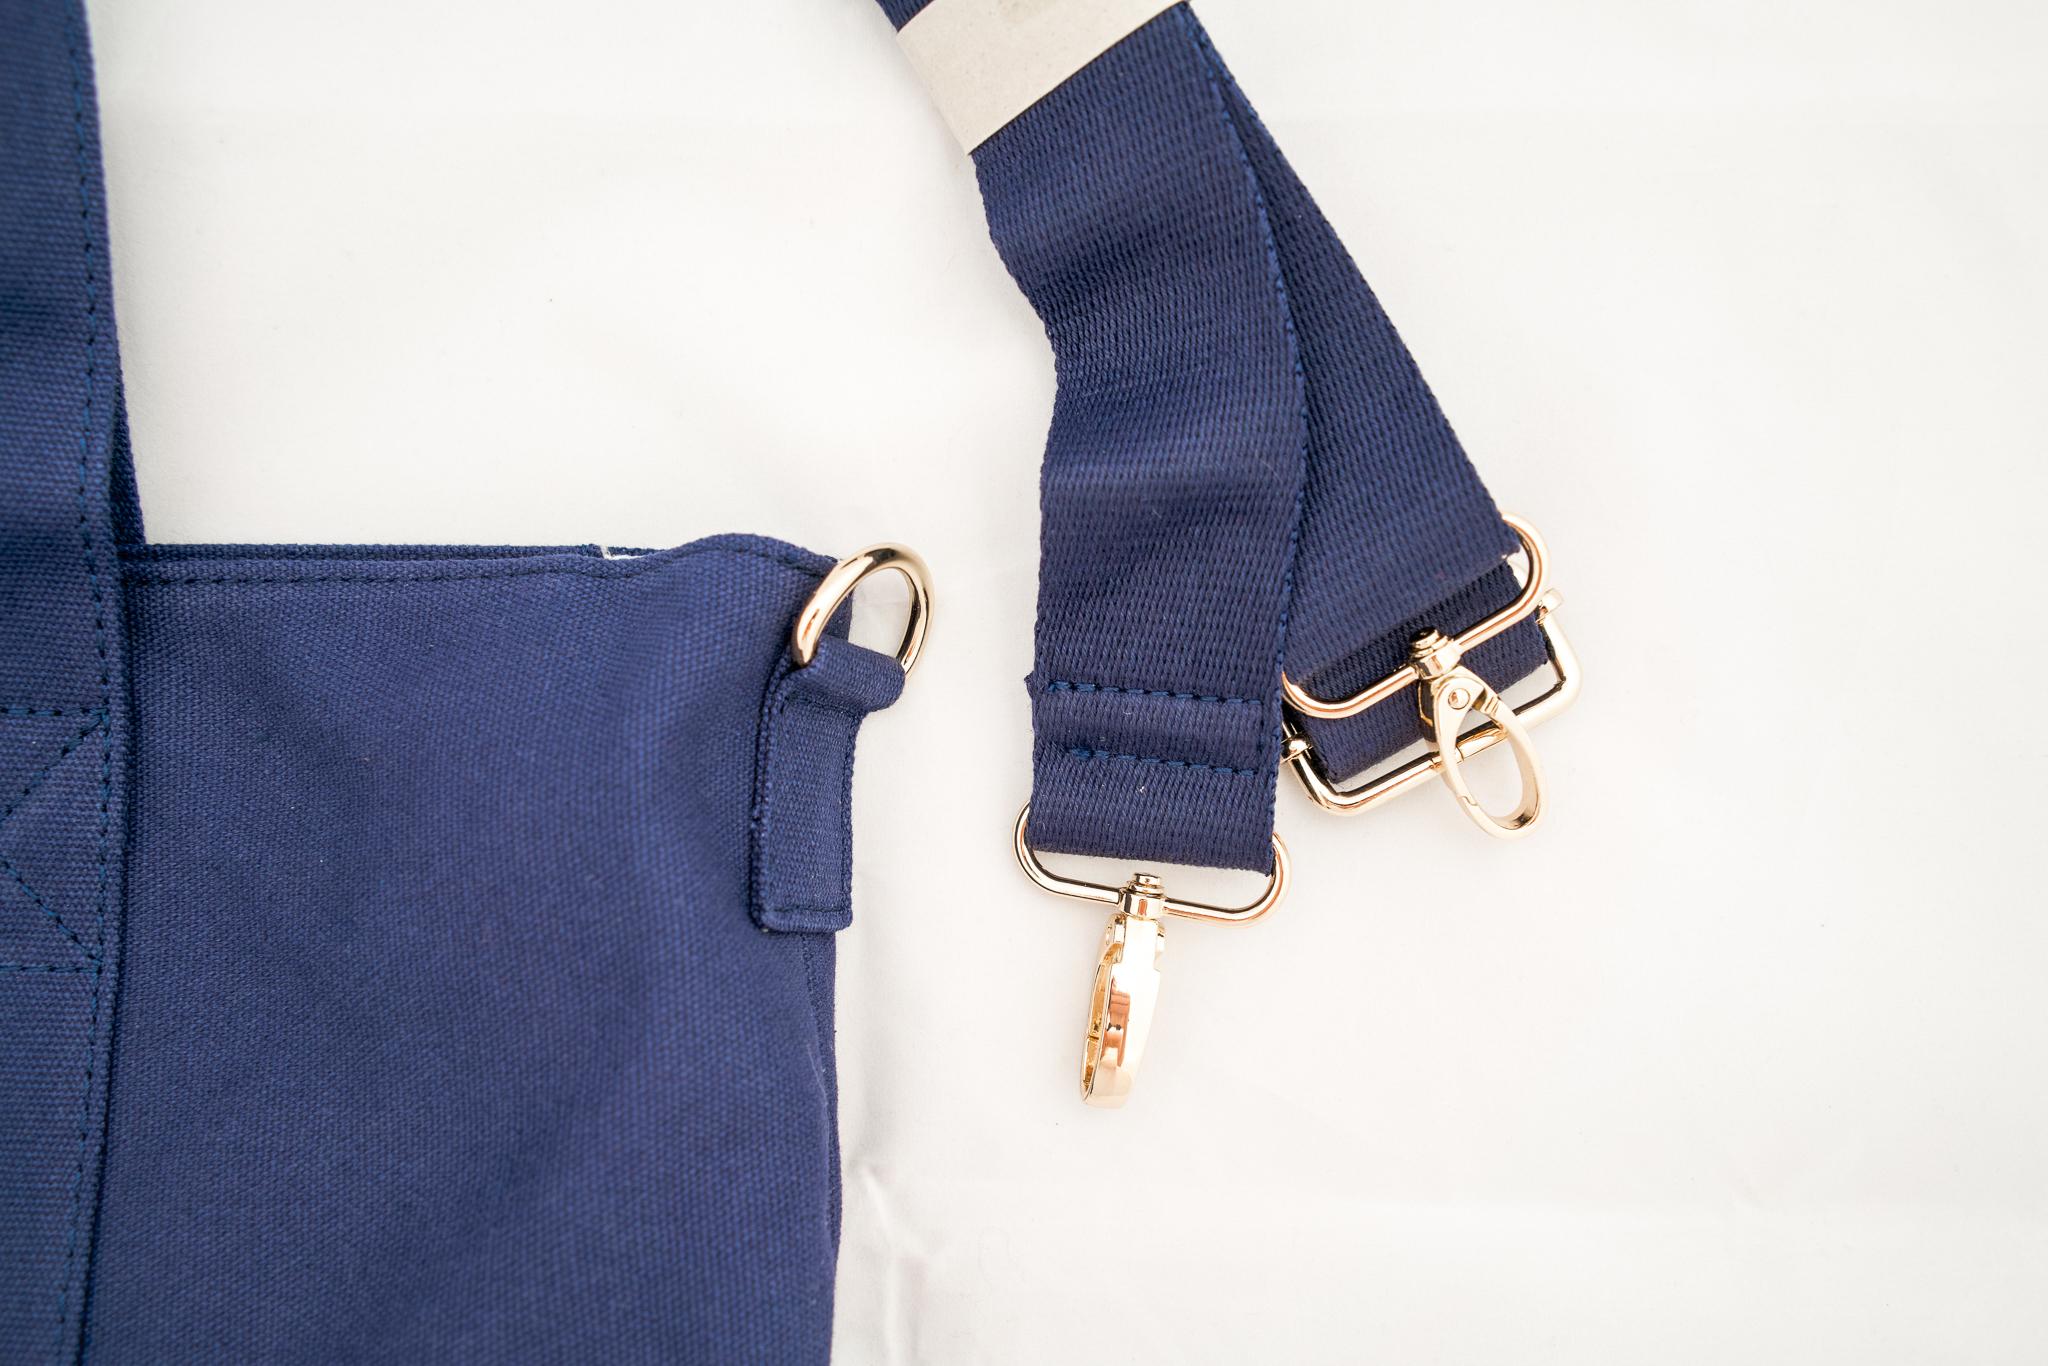 Penny Linn Designs bags